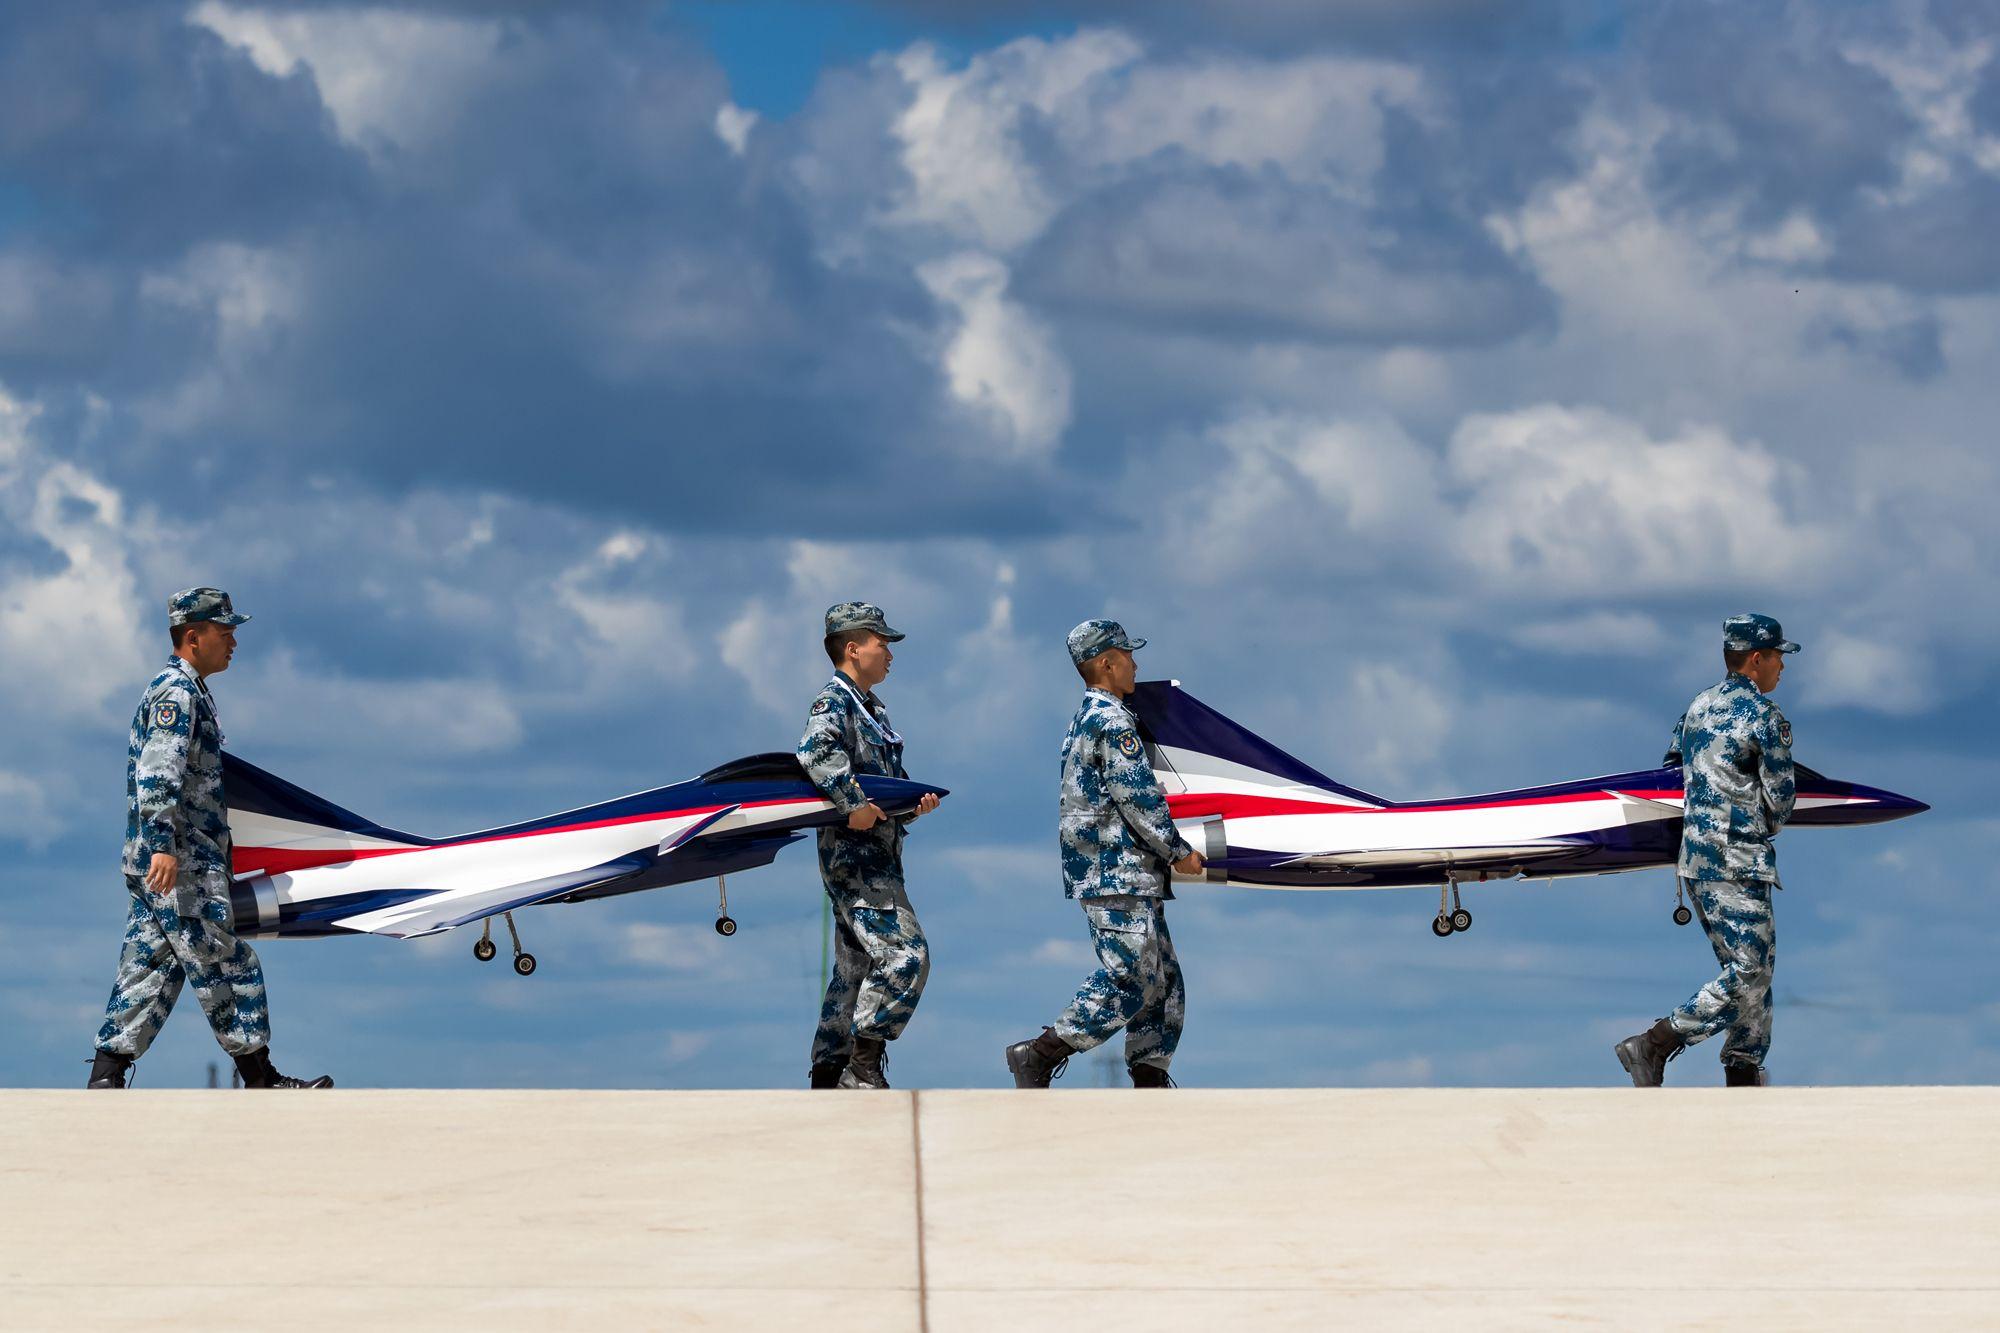 Counterfeit Air Power: Meet China's Copycat Air Force